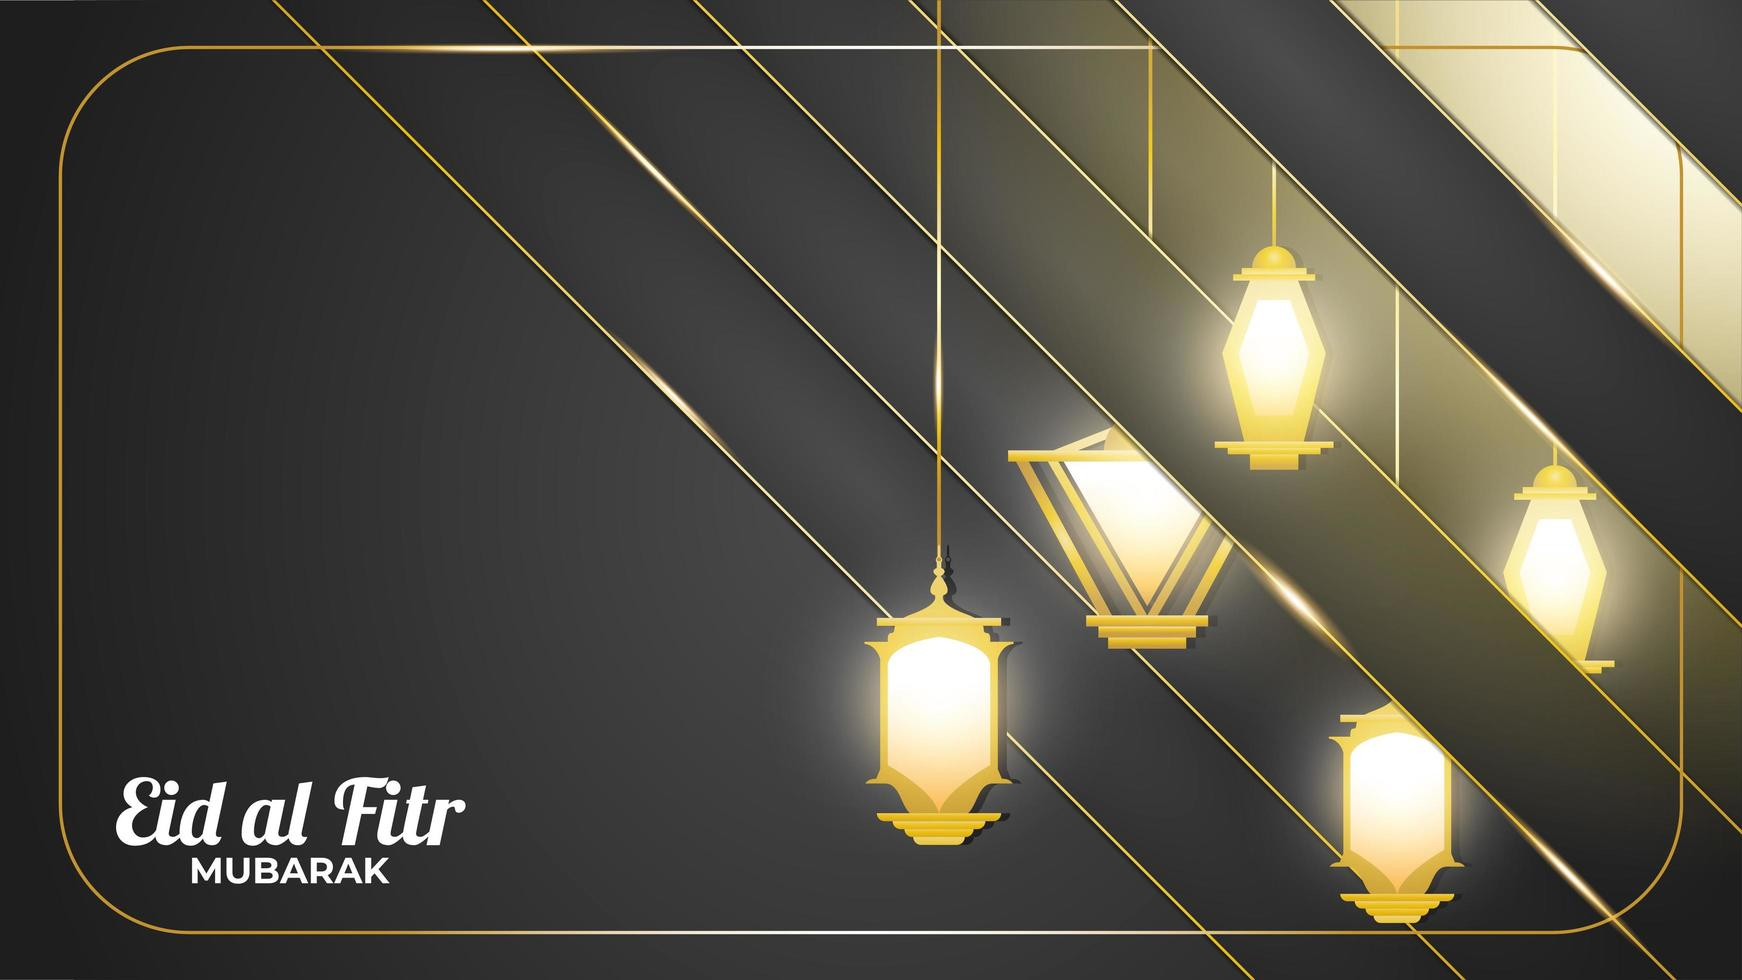 banner de eid mubarak com lanternas de ouro vetor